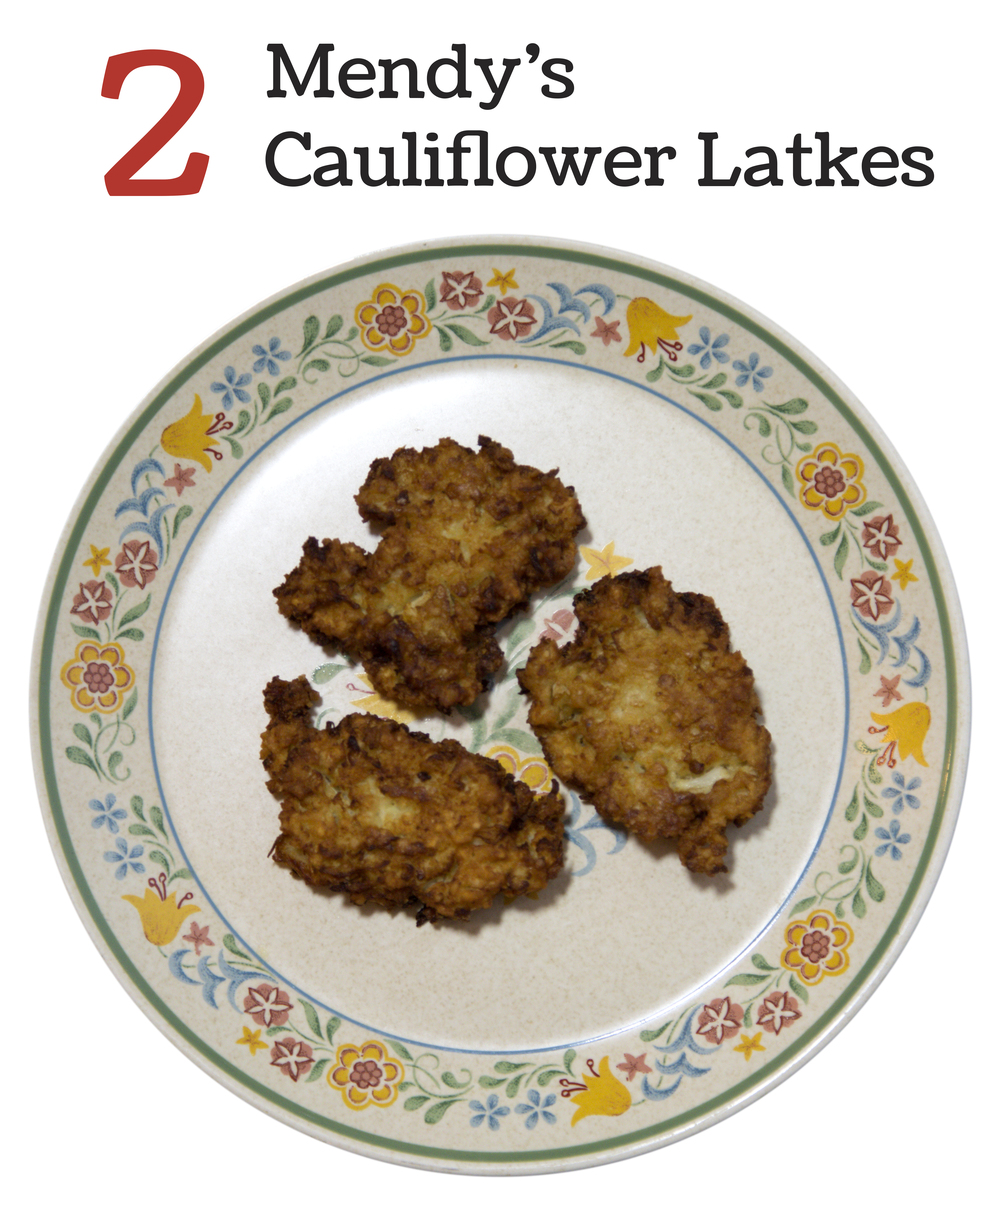 2 Mendy's Cauliflower Latkes.jpg